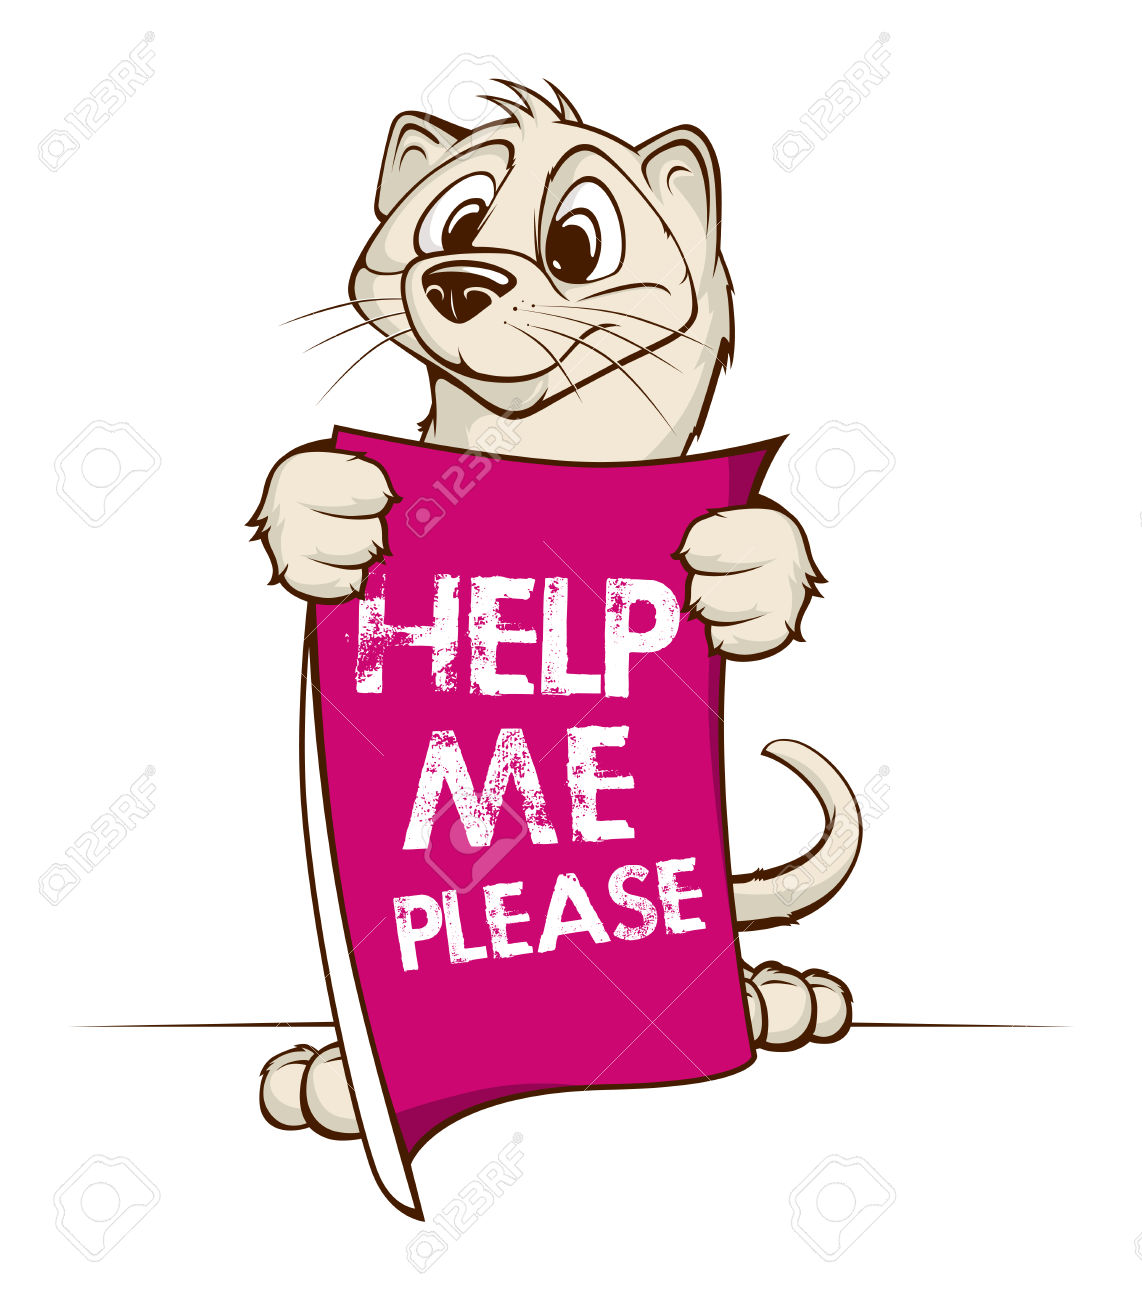 Please clipart Download clipart #9 Please clipart